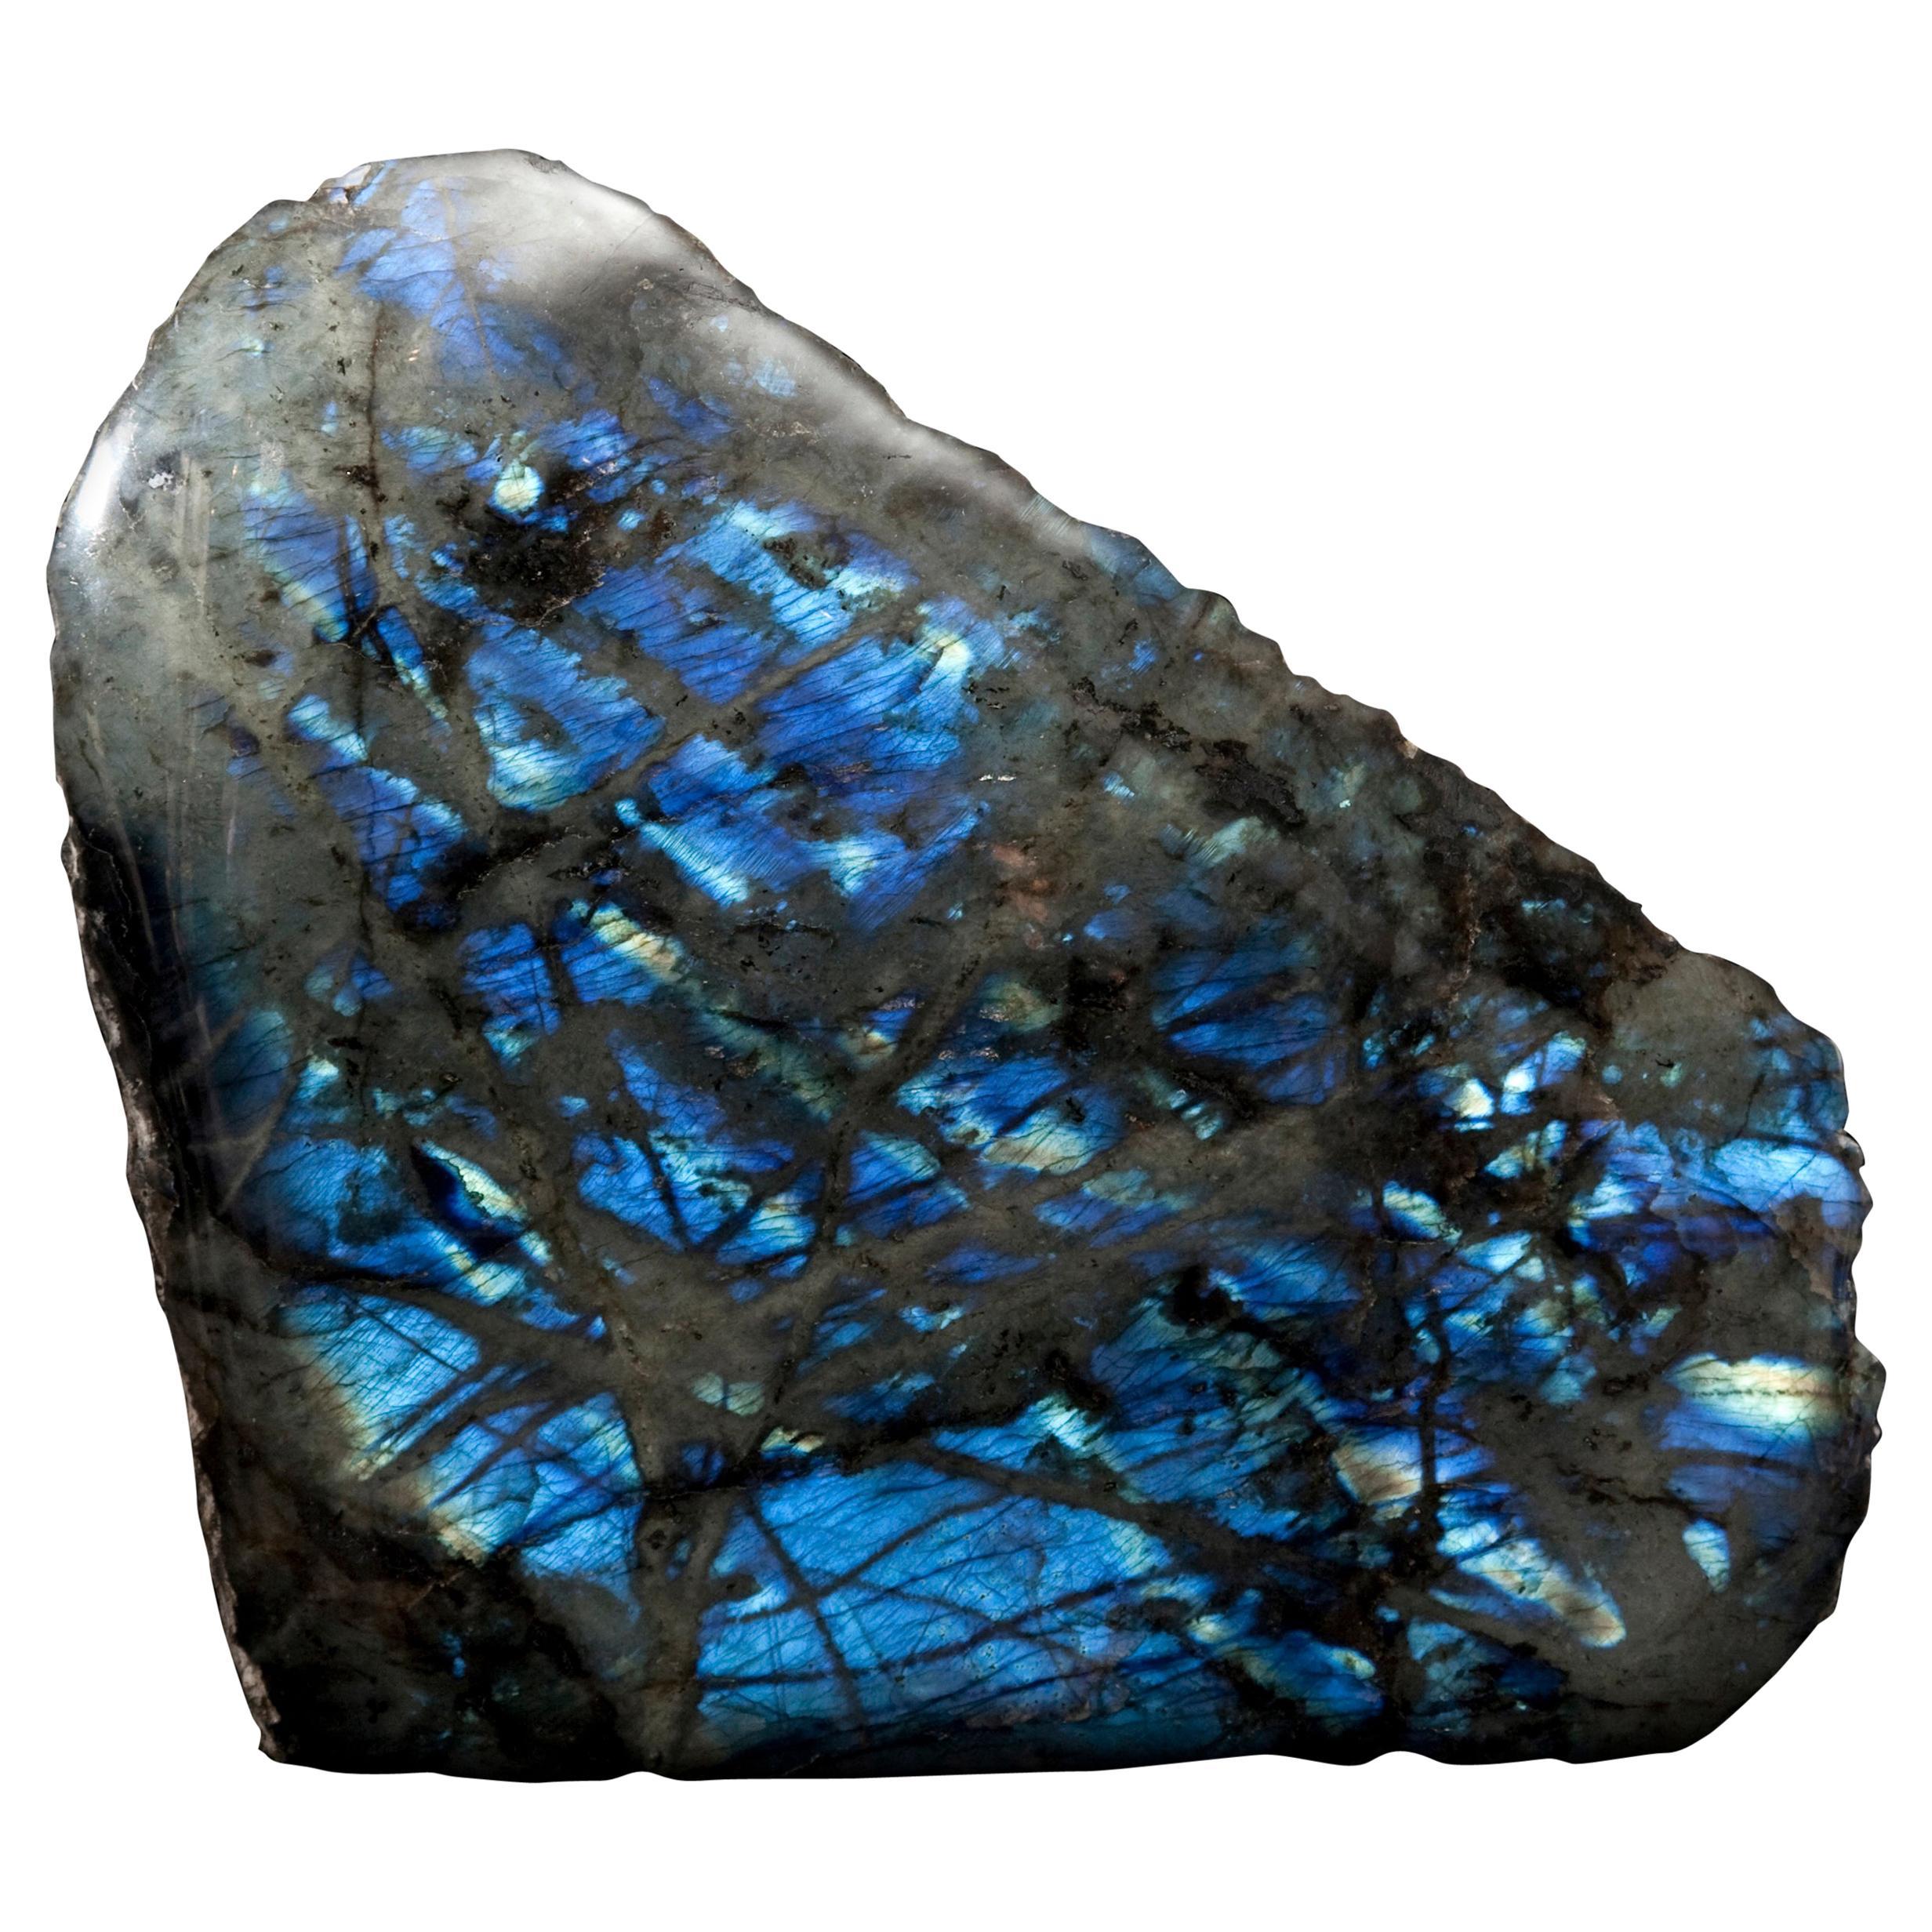 Freestanding Labradorite Crystal from Madagascar